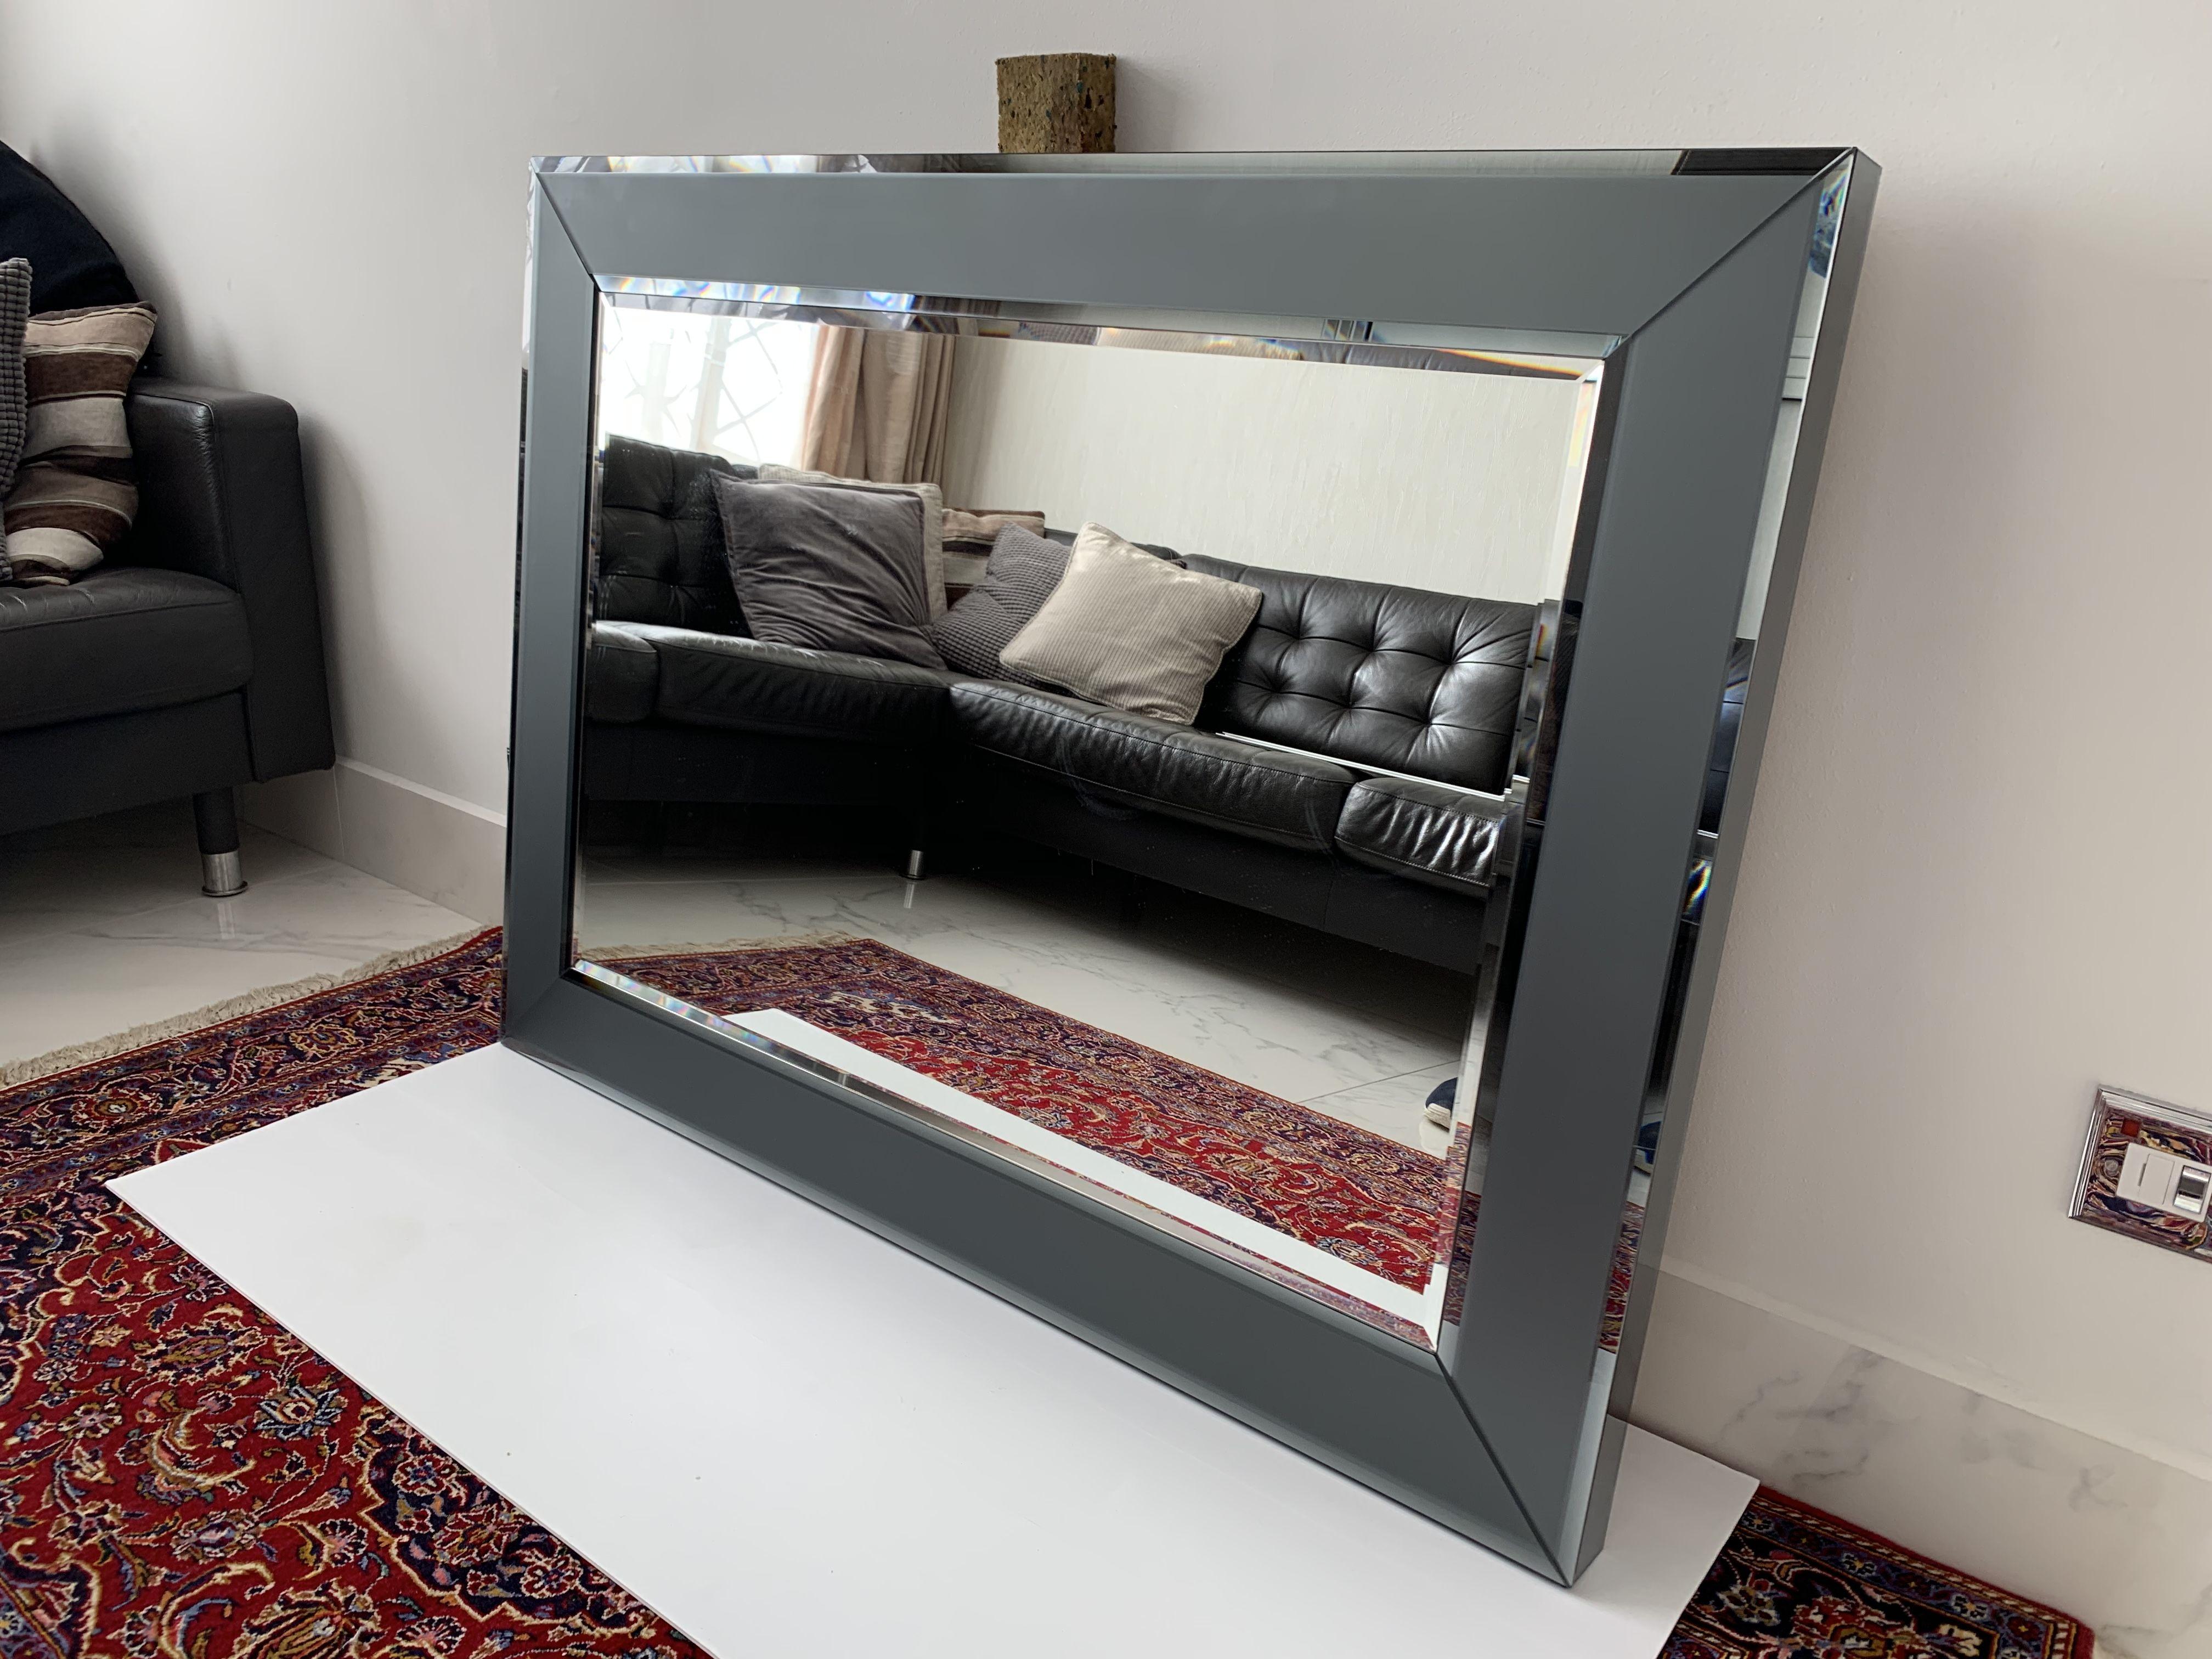 Mirrors_73